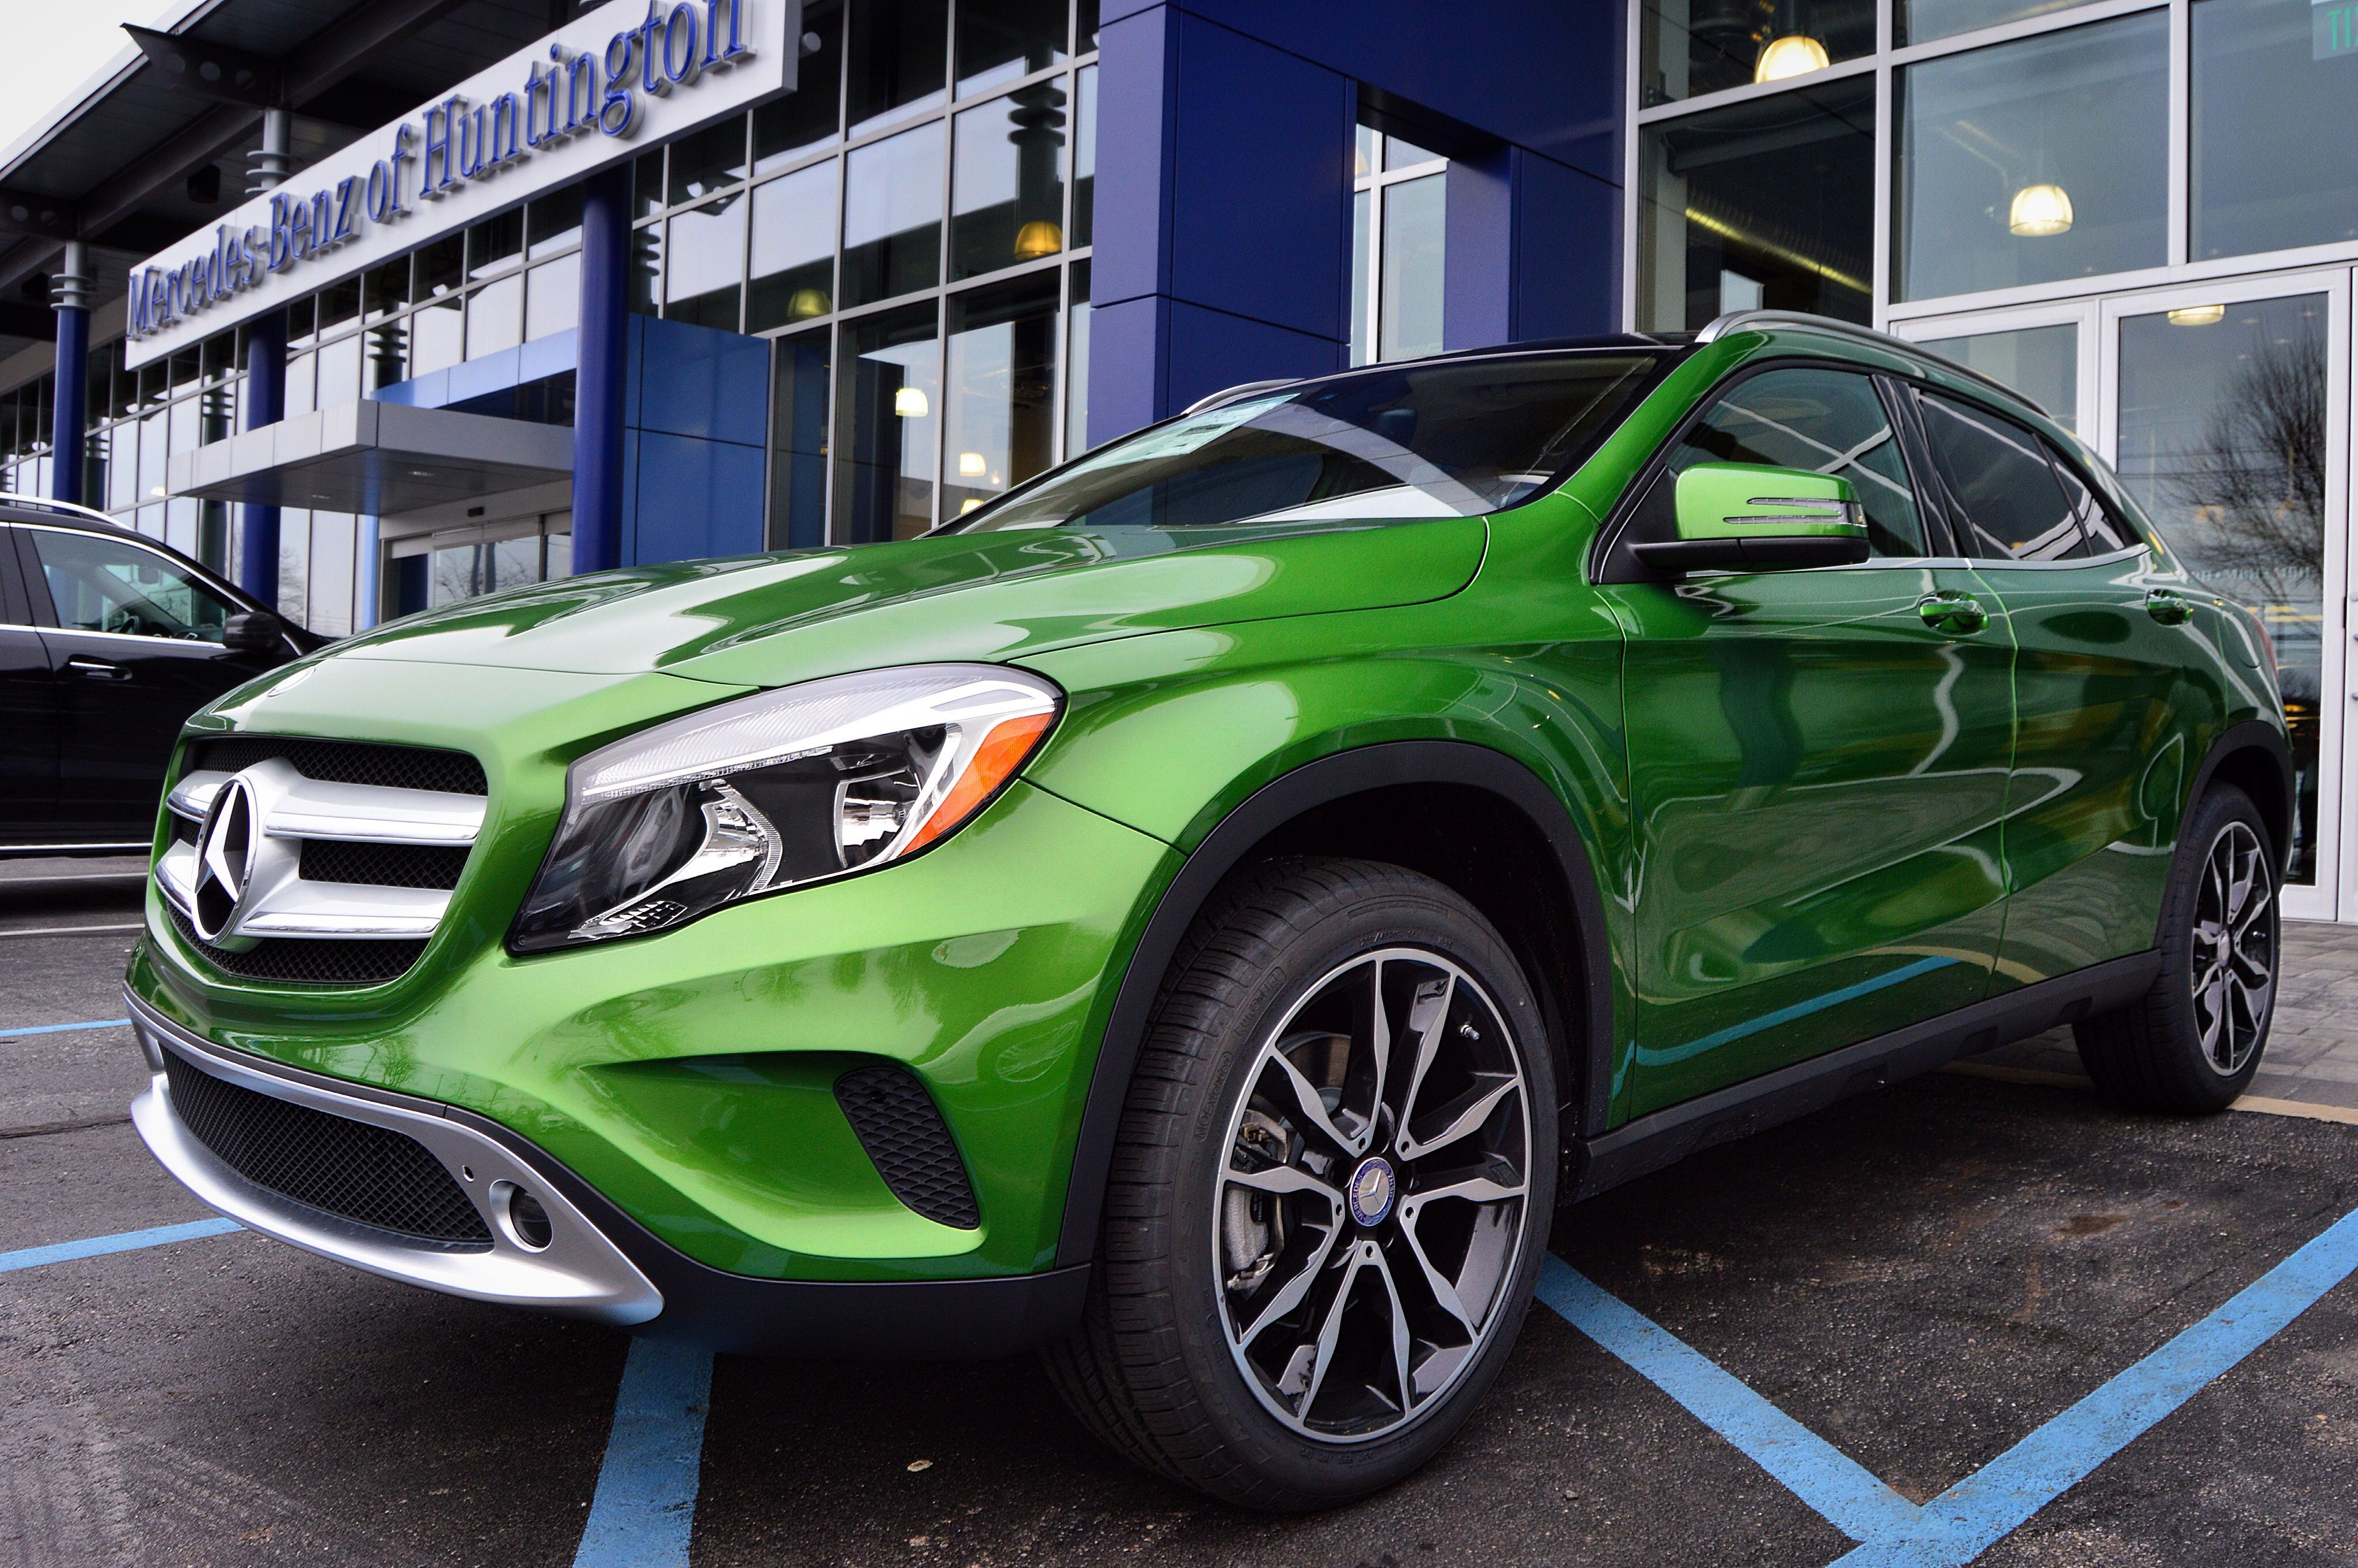 Cars kryptonite green gla class mb mercedesbenz mercedes benz